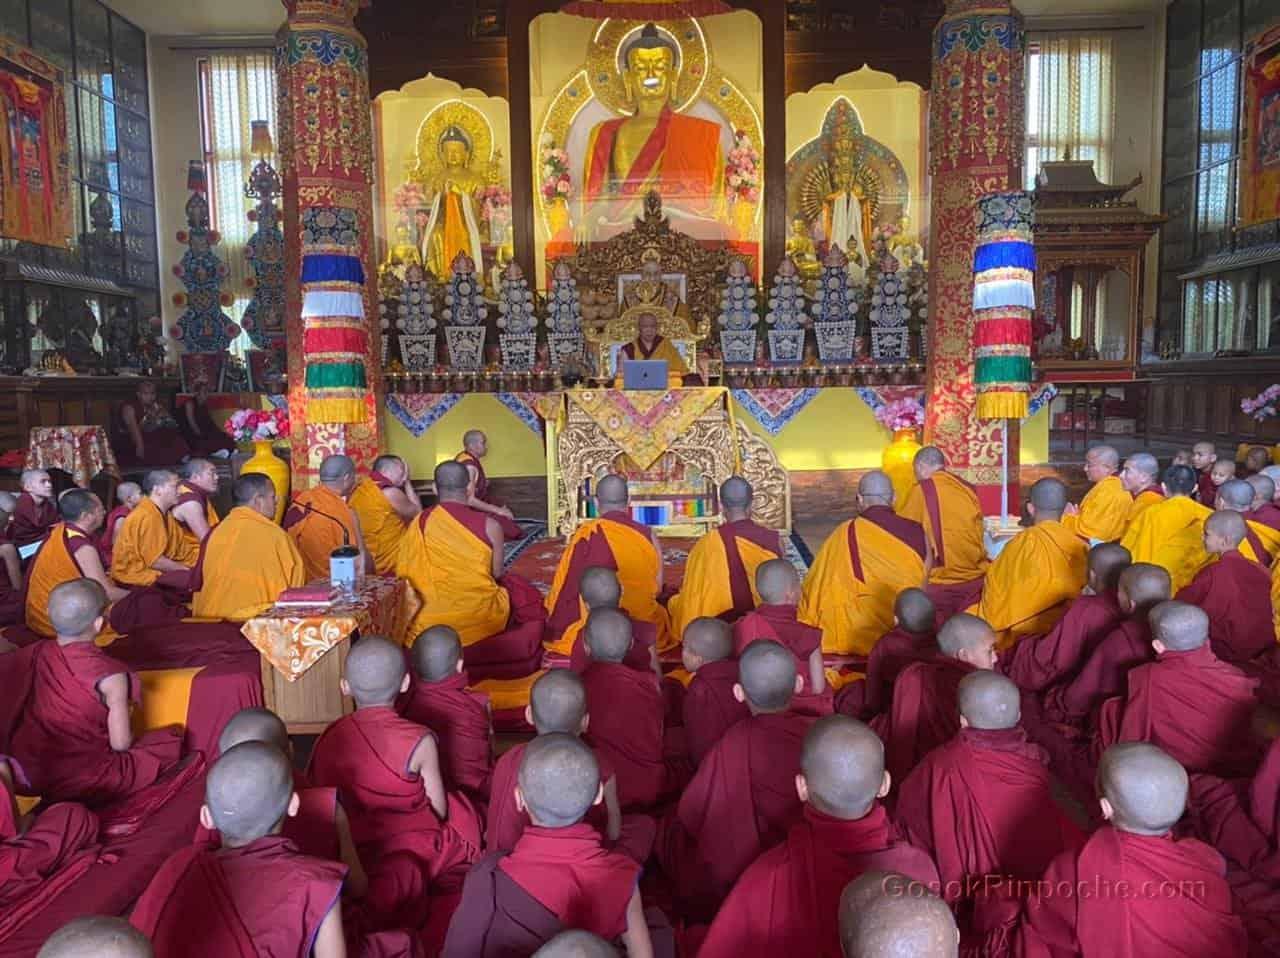 Monlam Chenmo d3 2021-02-26 at 4.31.13 AM